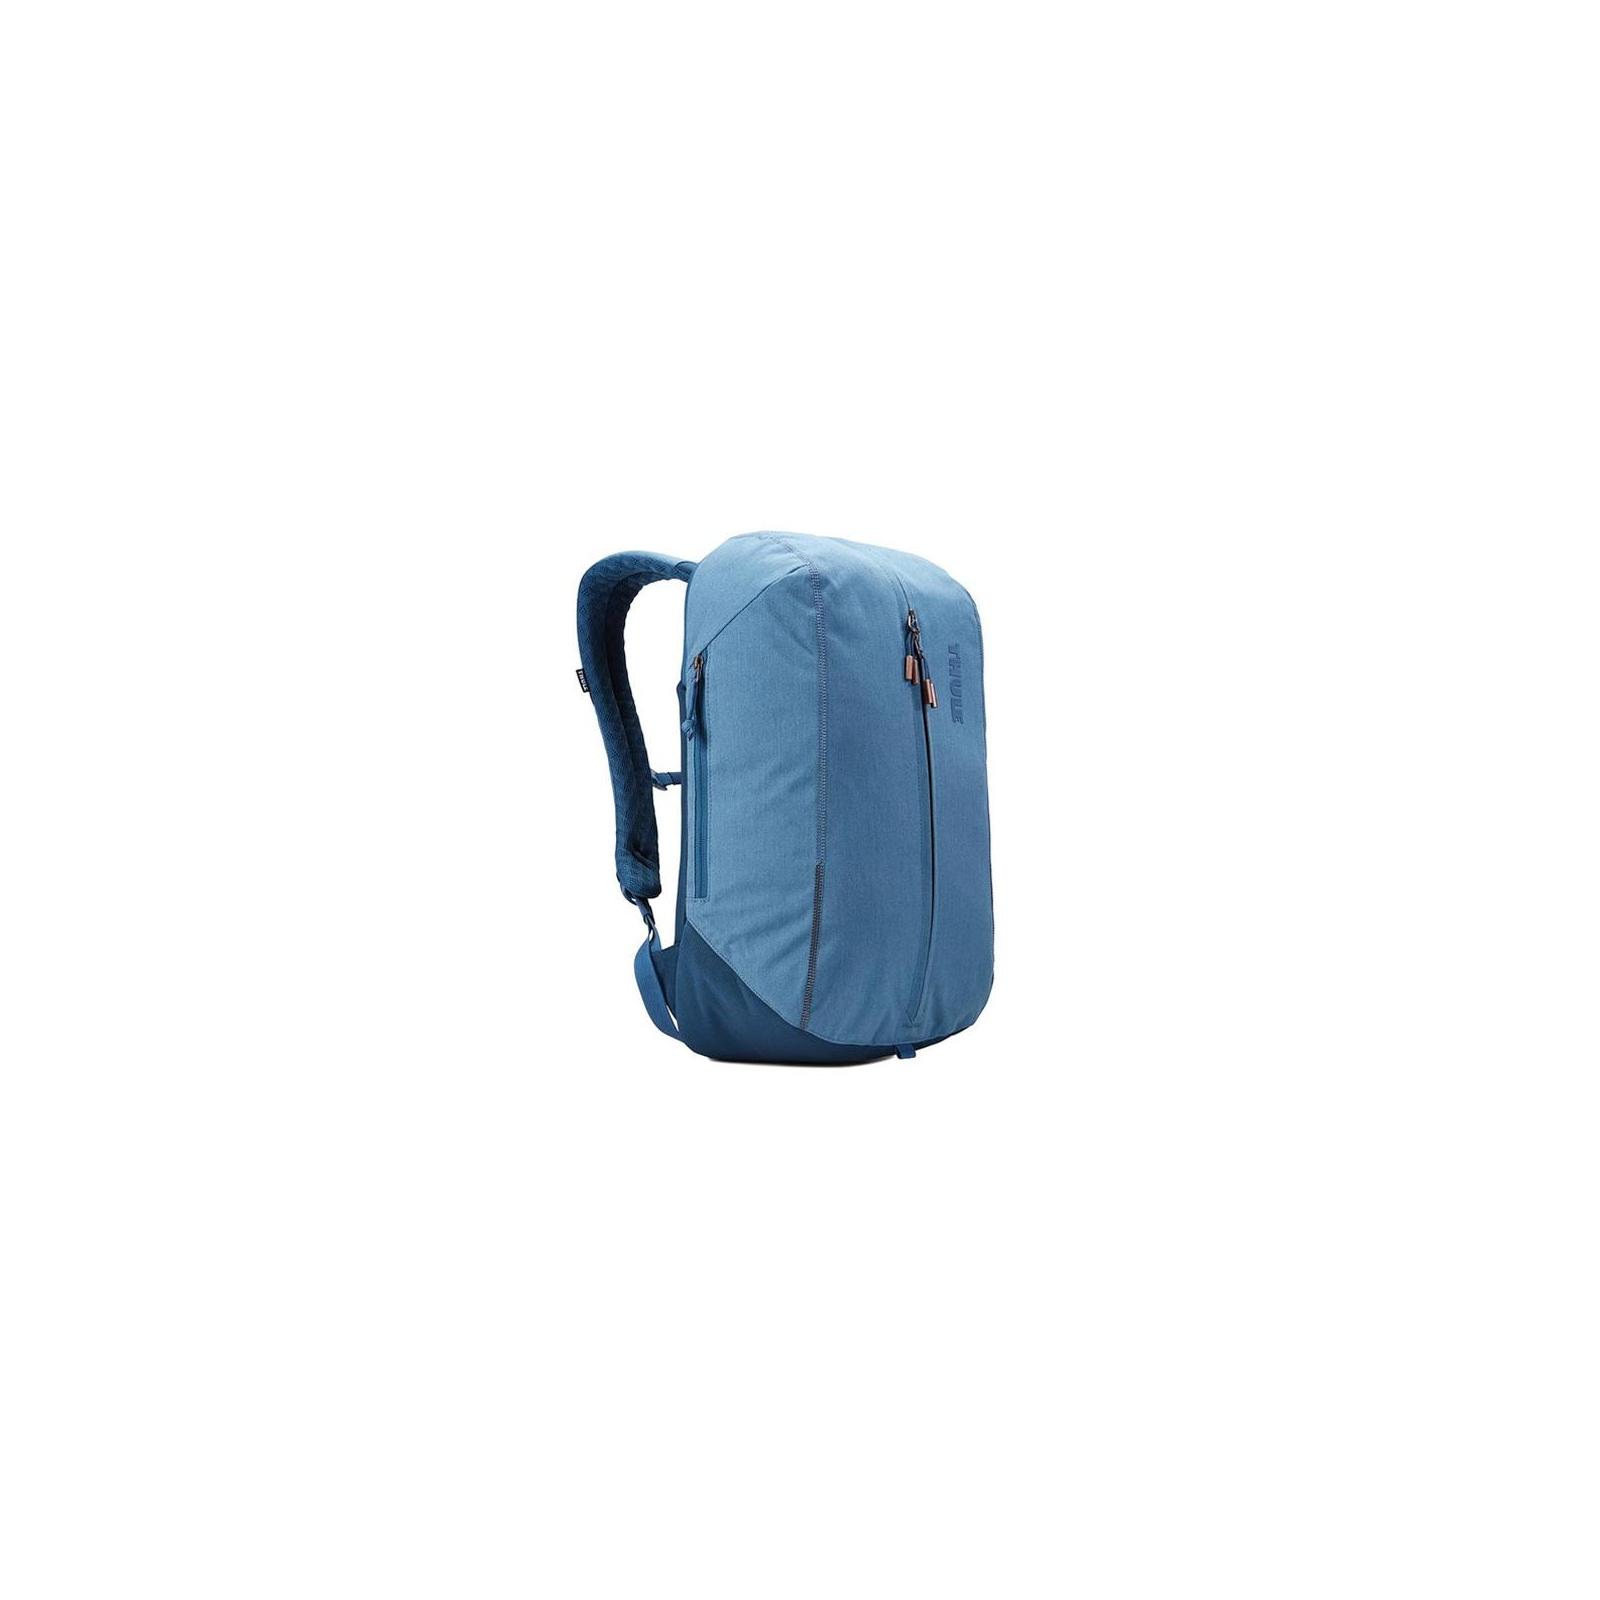 "Рюкзак для ноутбука Thule 15"" Vea 17L (Light Navy) TVIP115LNV (3203507)"